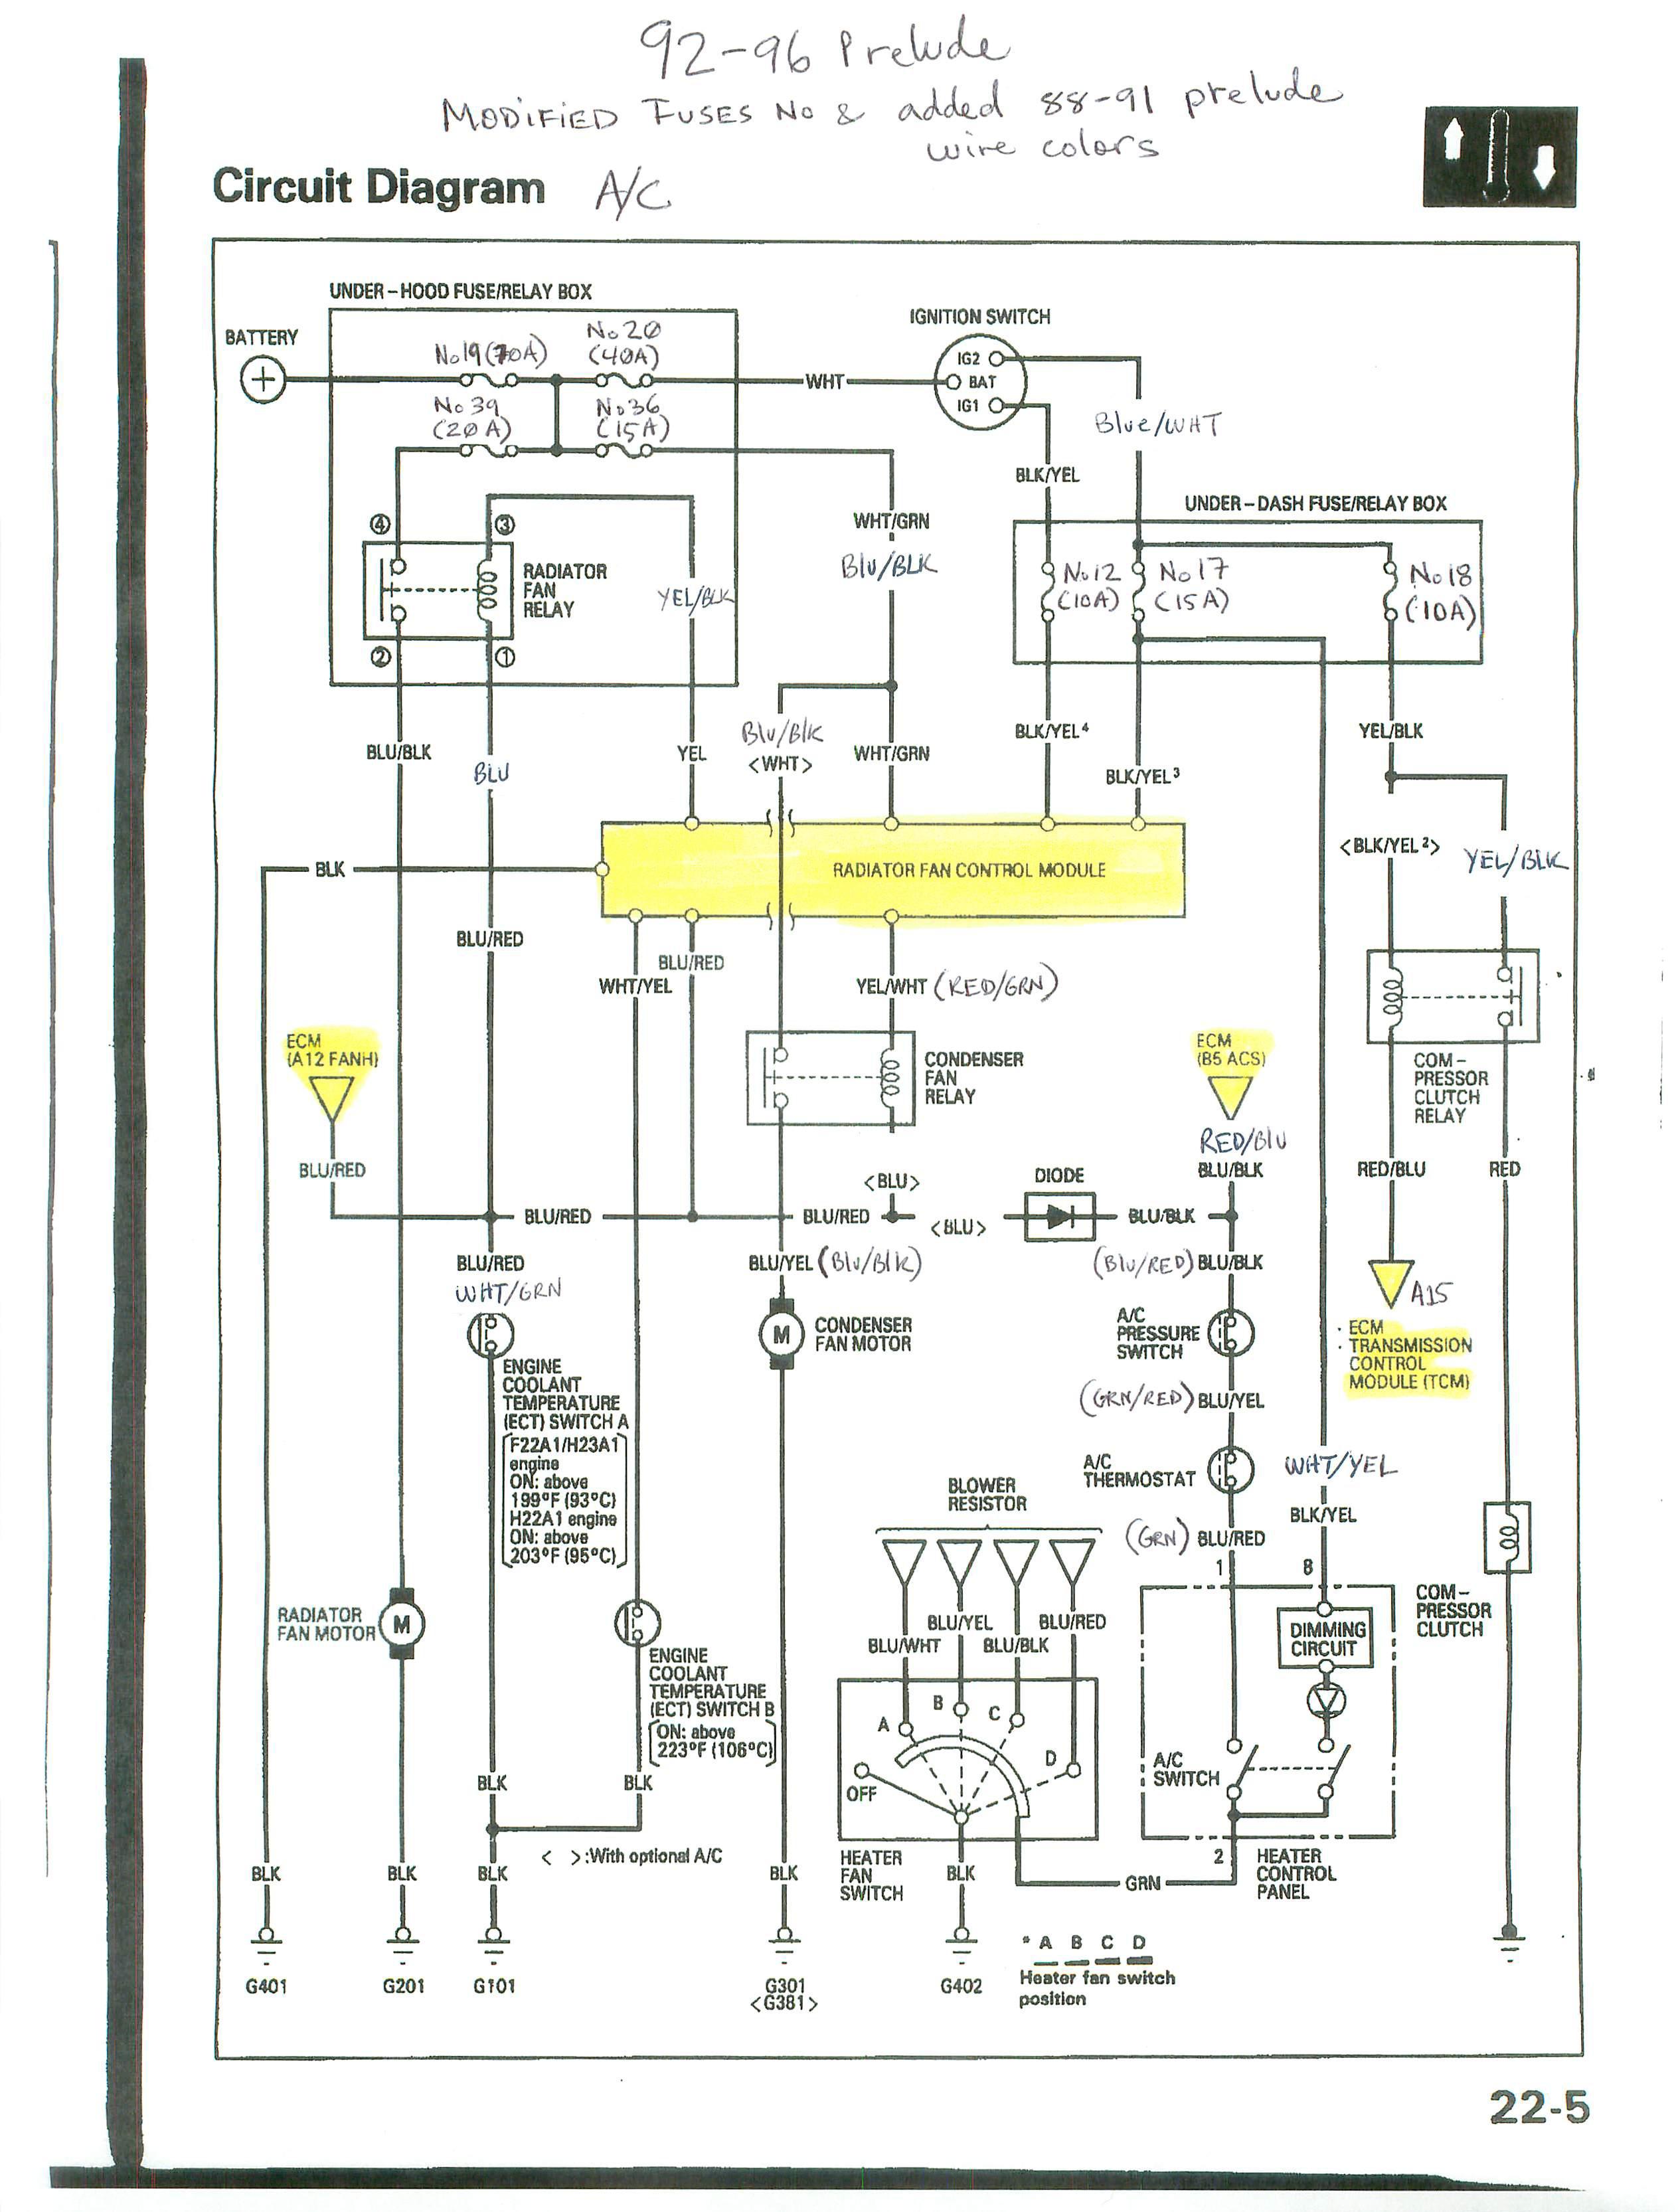 1992 honda prelude headlight wiring diagram rheem air handler 83 p30 get free image about